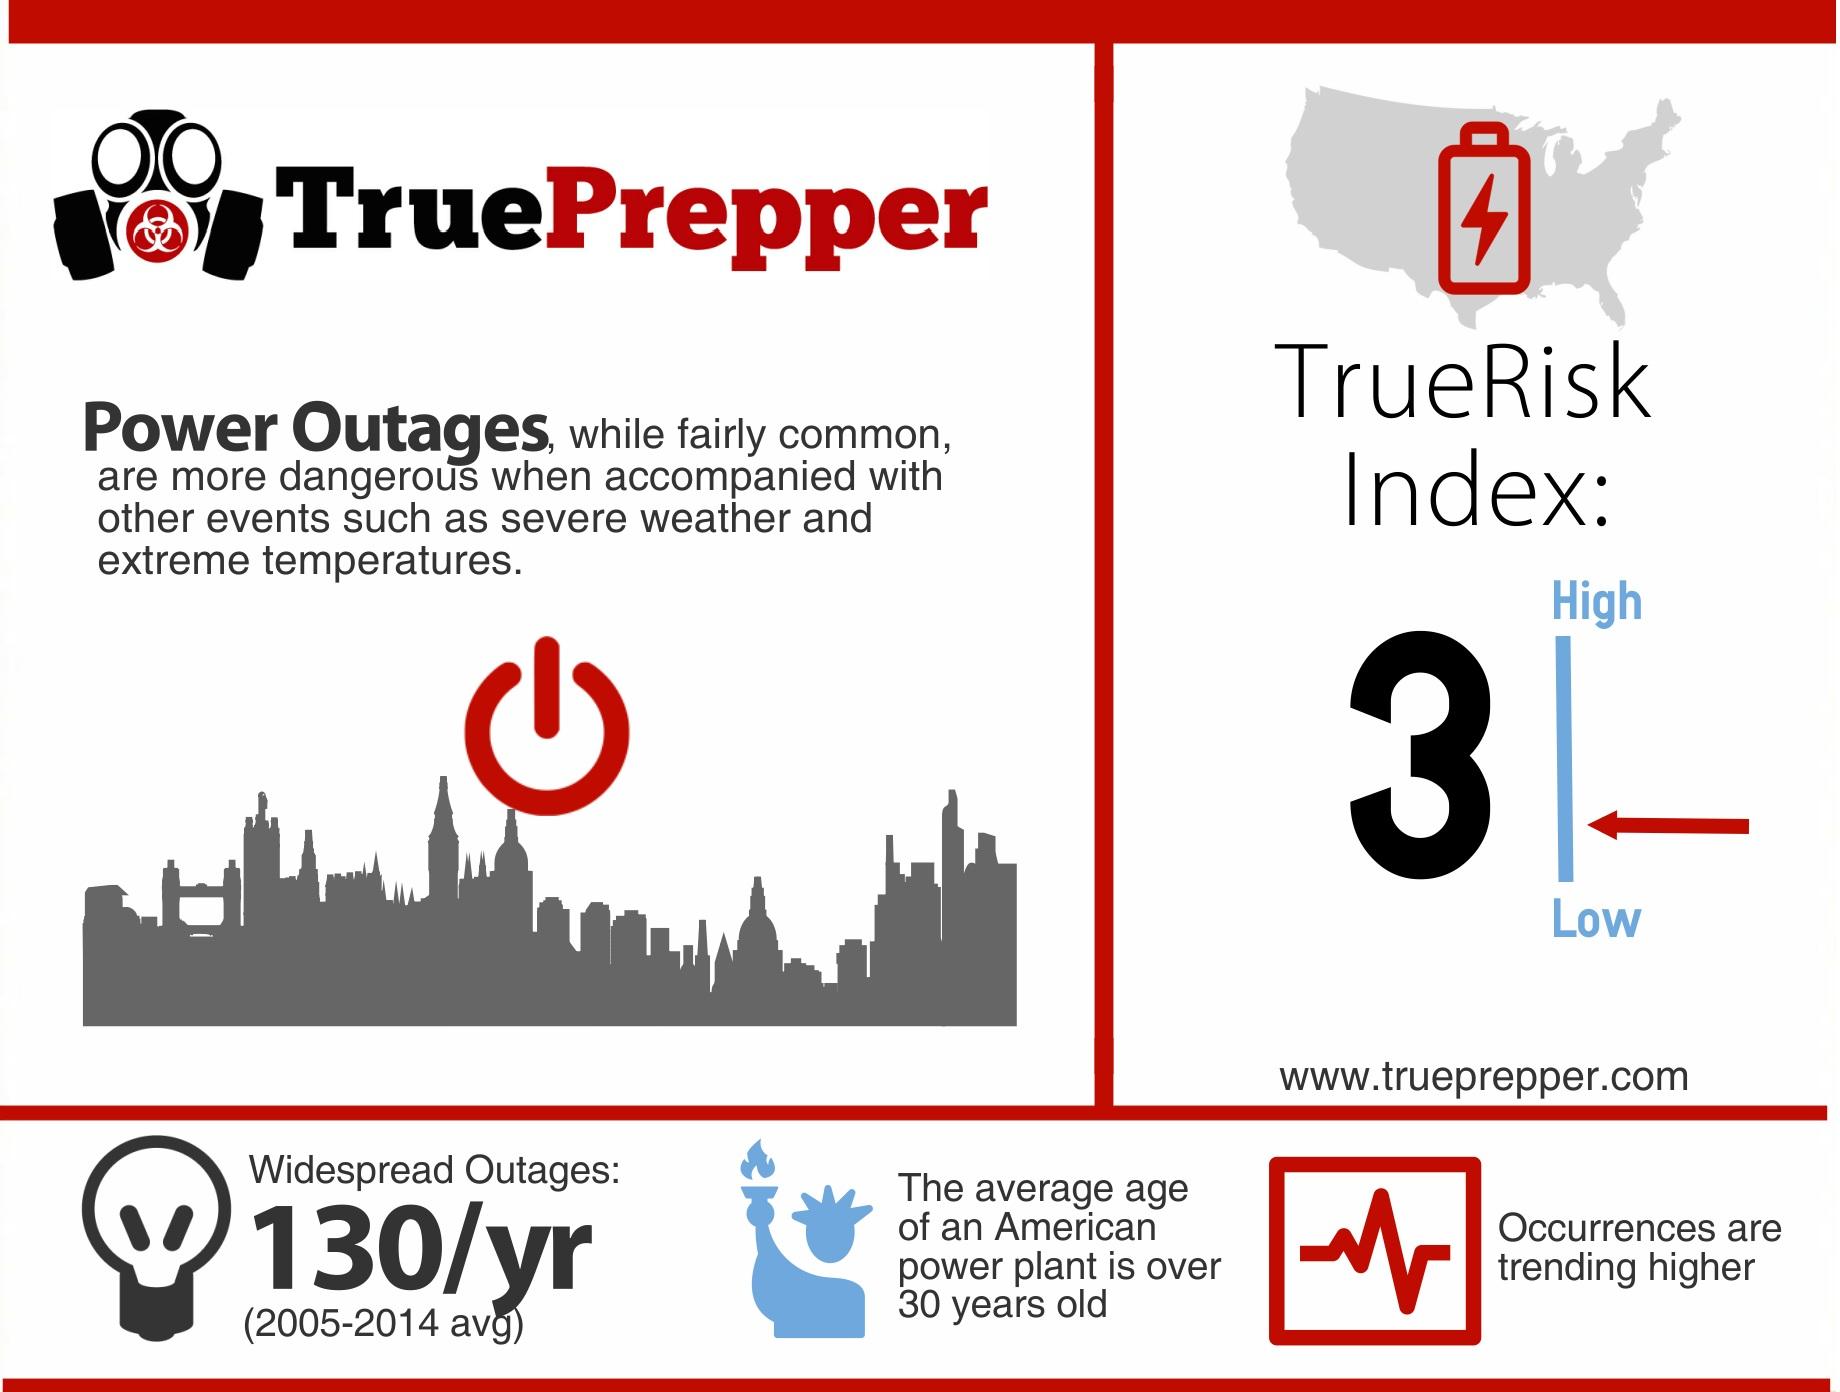 TrueRisk Power Outage